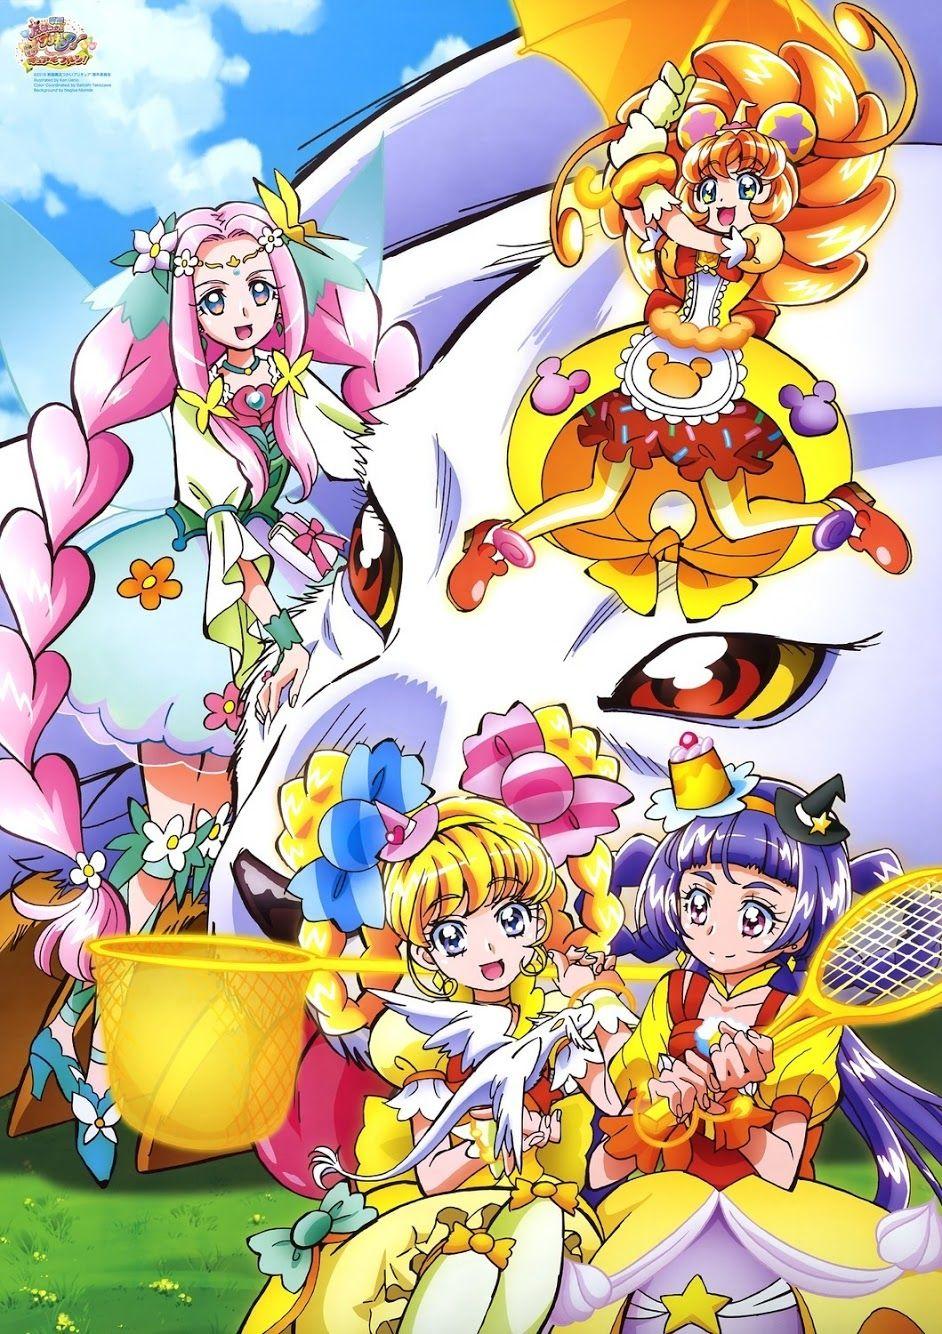 Mahou Tsukai Pretty Cure おしゃれまとめの人気アイデア Pinterest Anitacrown プリキュア イラスト セーラームーン 壁紙 魔法つかい プリキュア